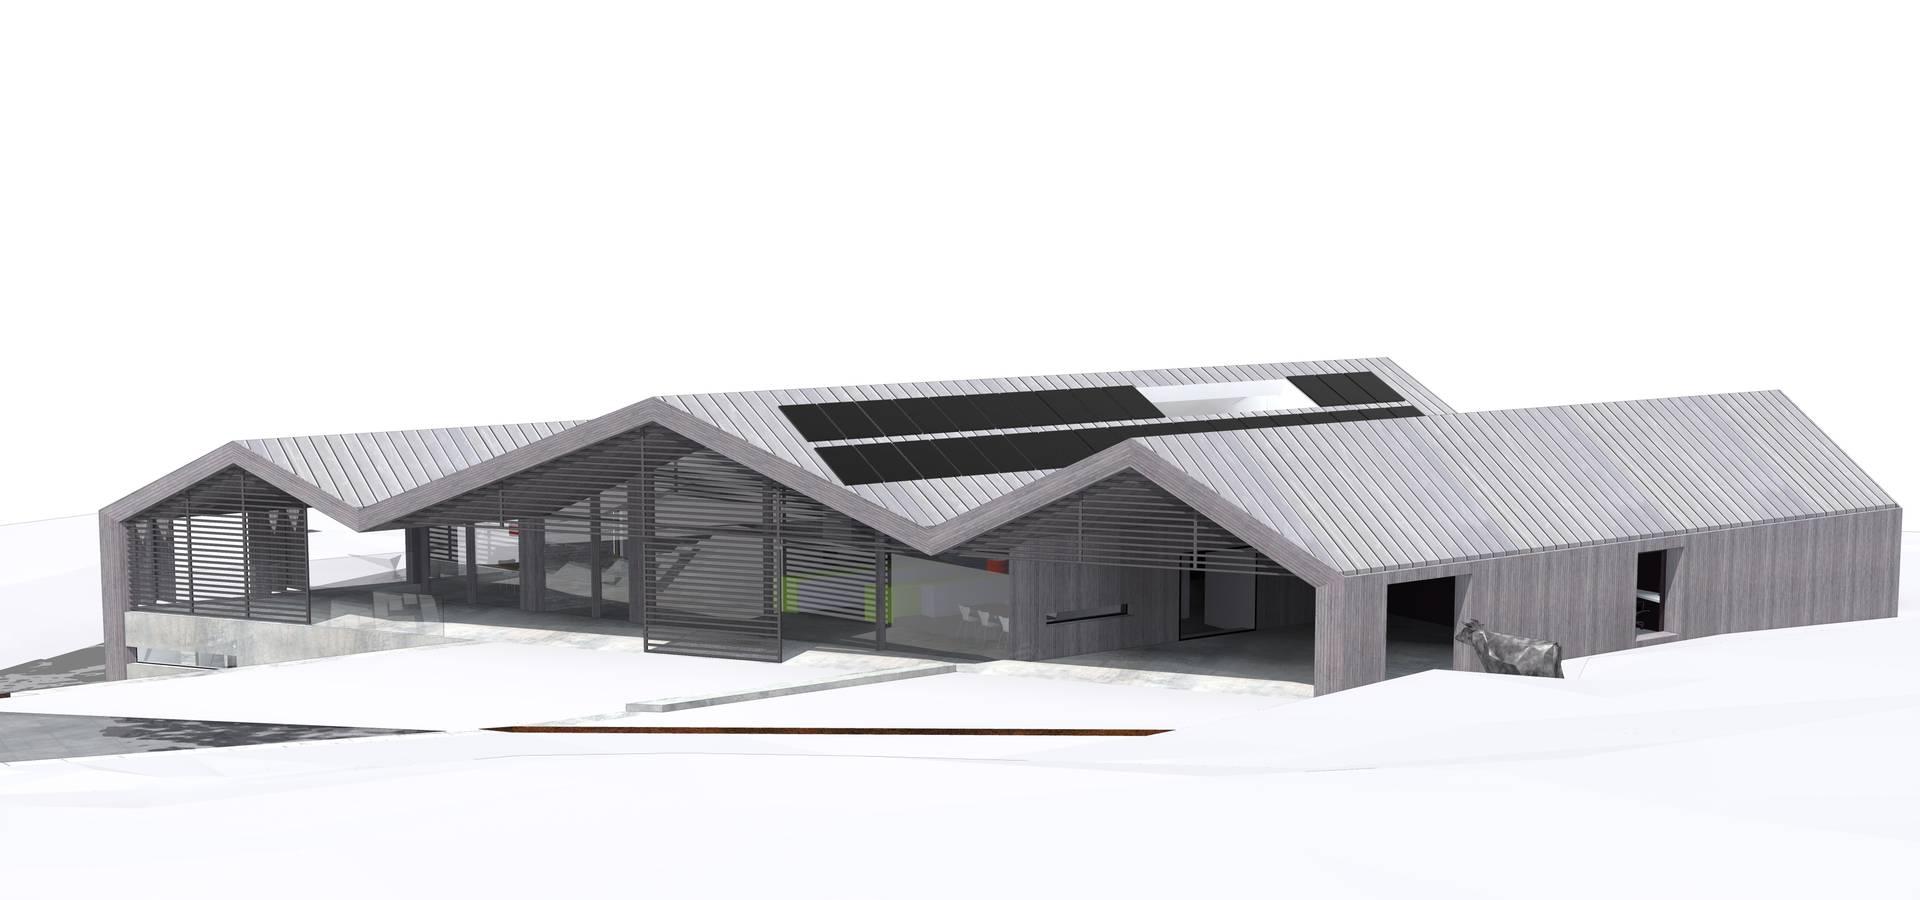 Seymour-Smith Architects